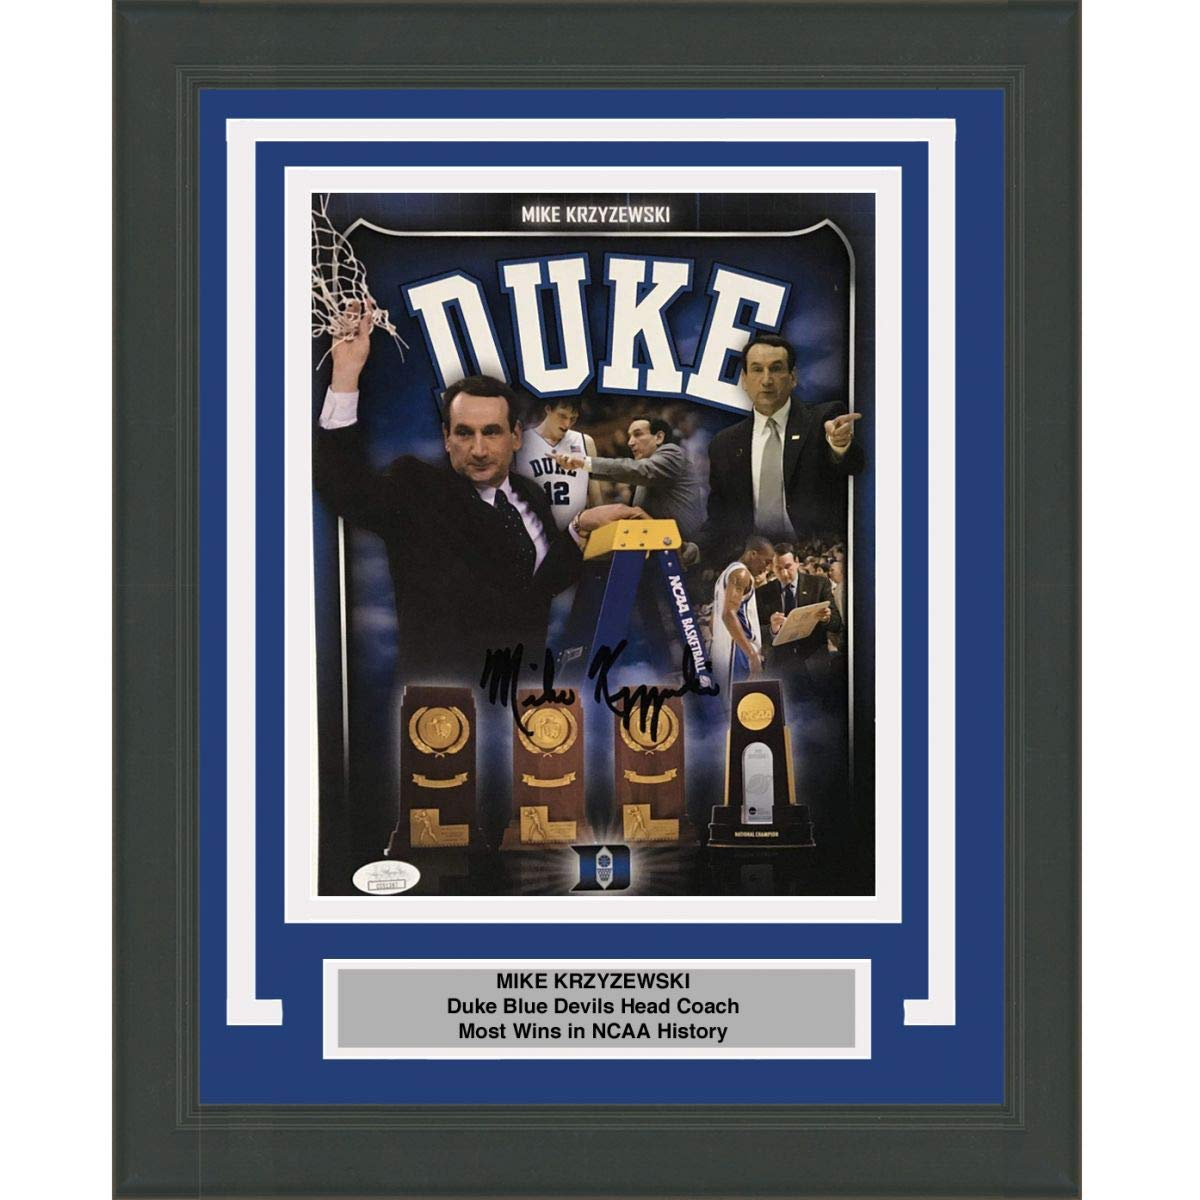 aa1a9ec48e08 Framed Autographed Signed Mike Krzyzewski Coach K Duke Blue Devils 8x10  Basketball Photo JSA COA  2 at Amazon s Sports Collectibles Store